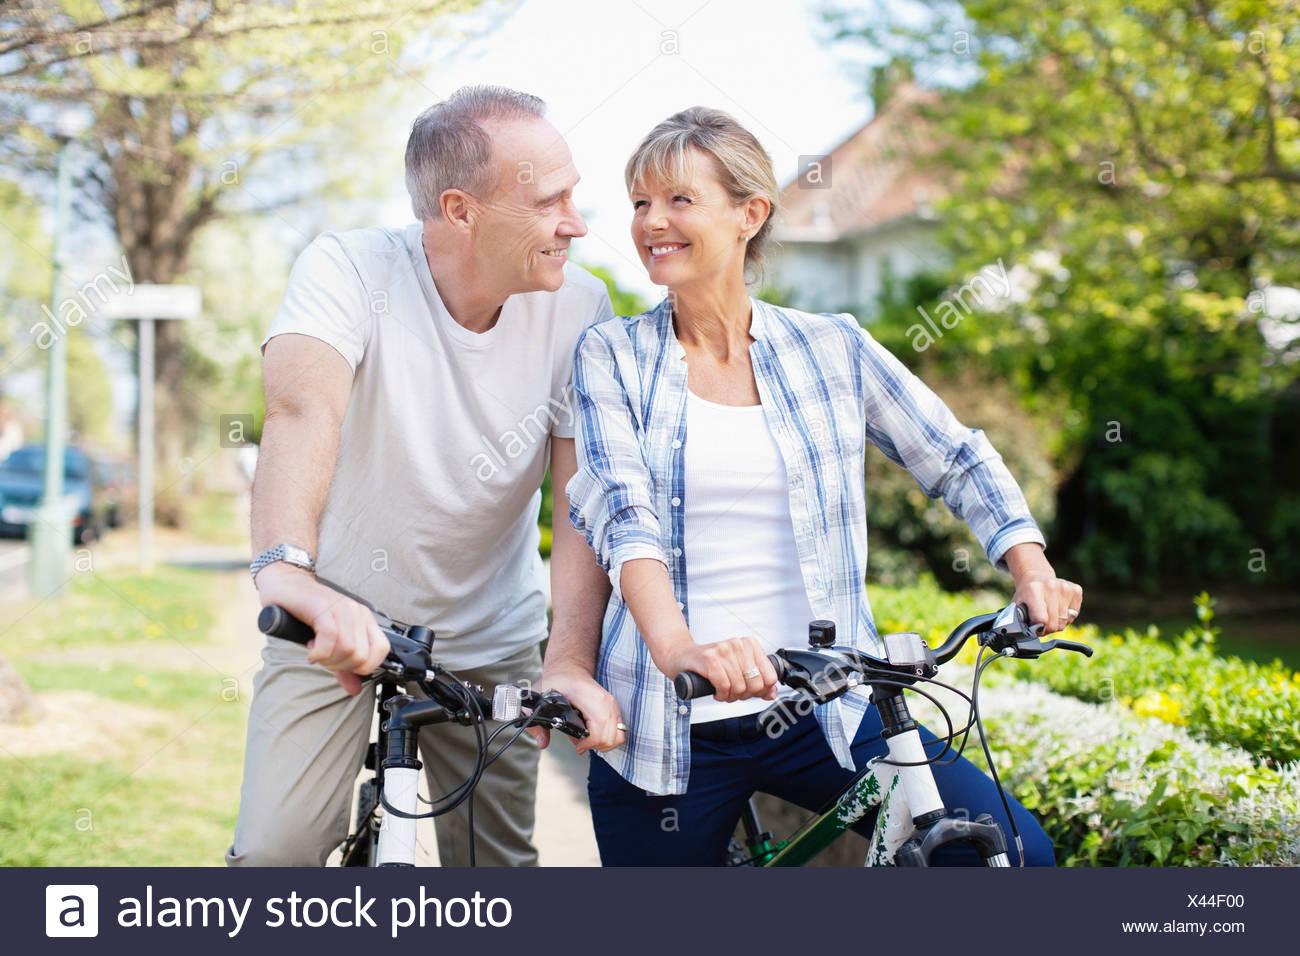 Senior couple riding bicycles - Stock Image